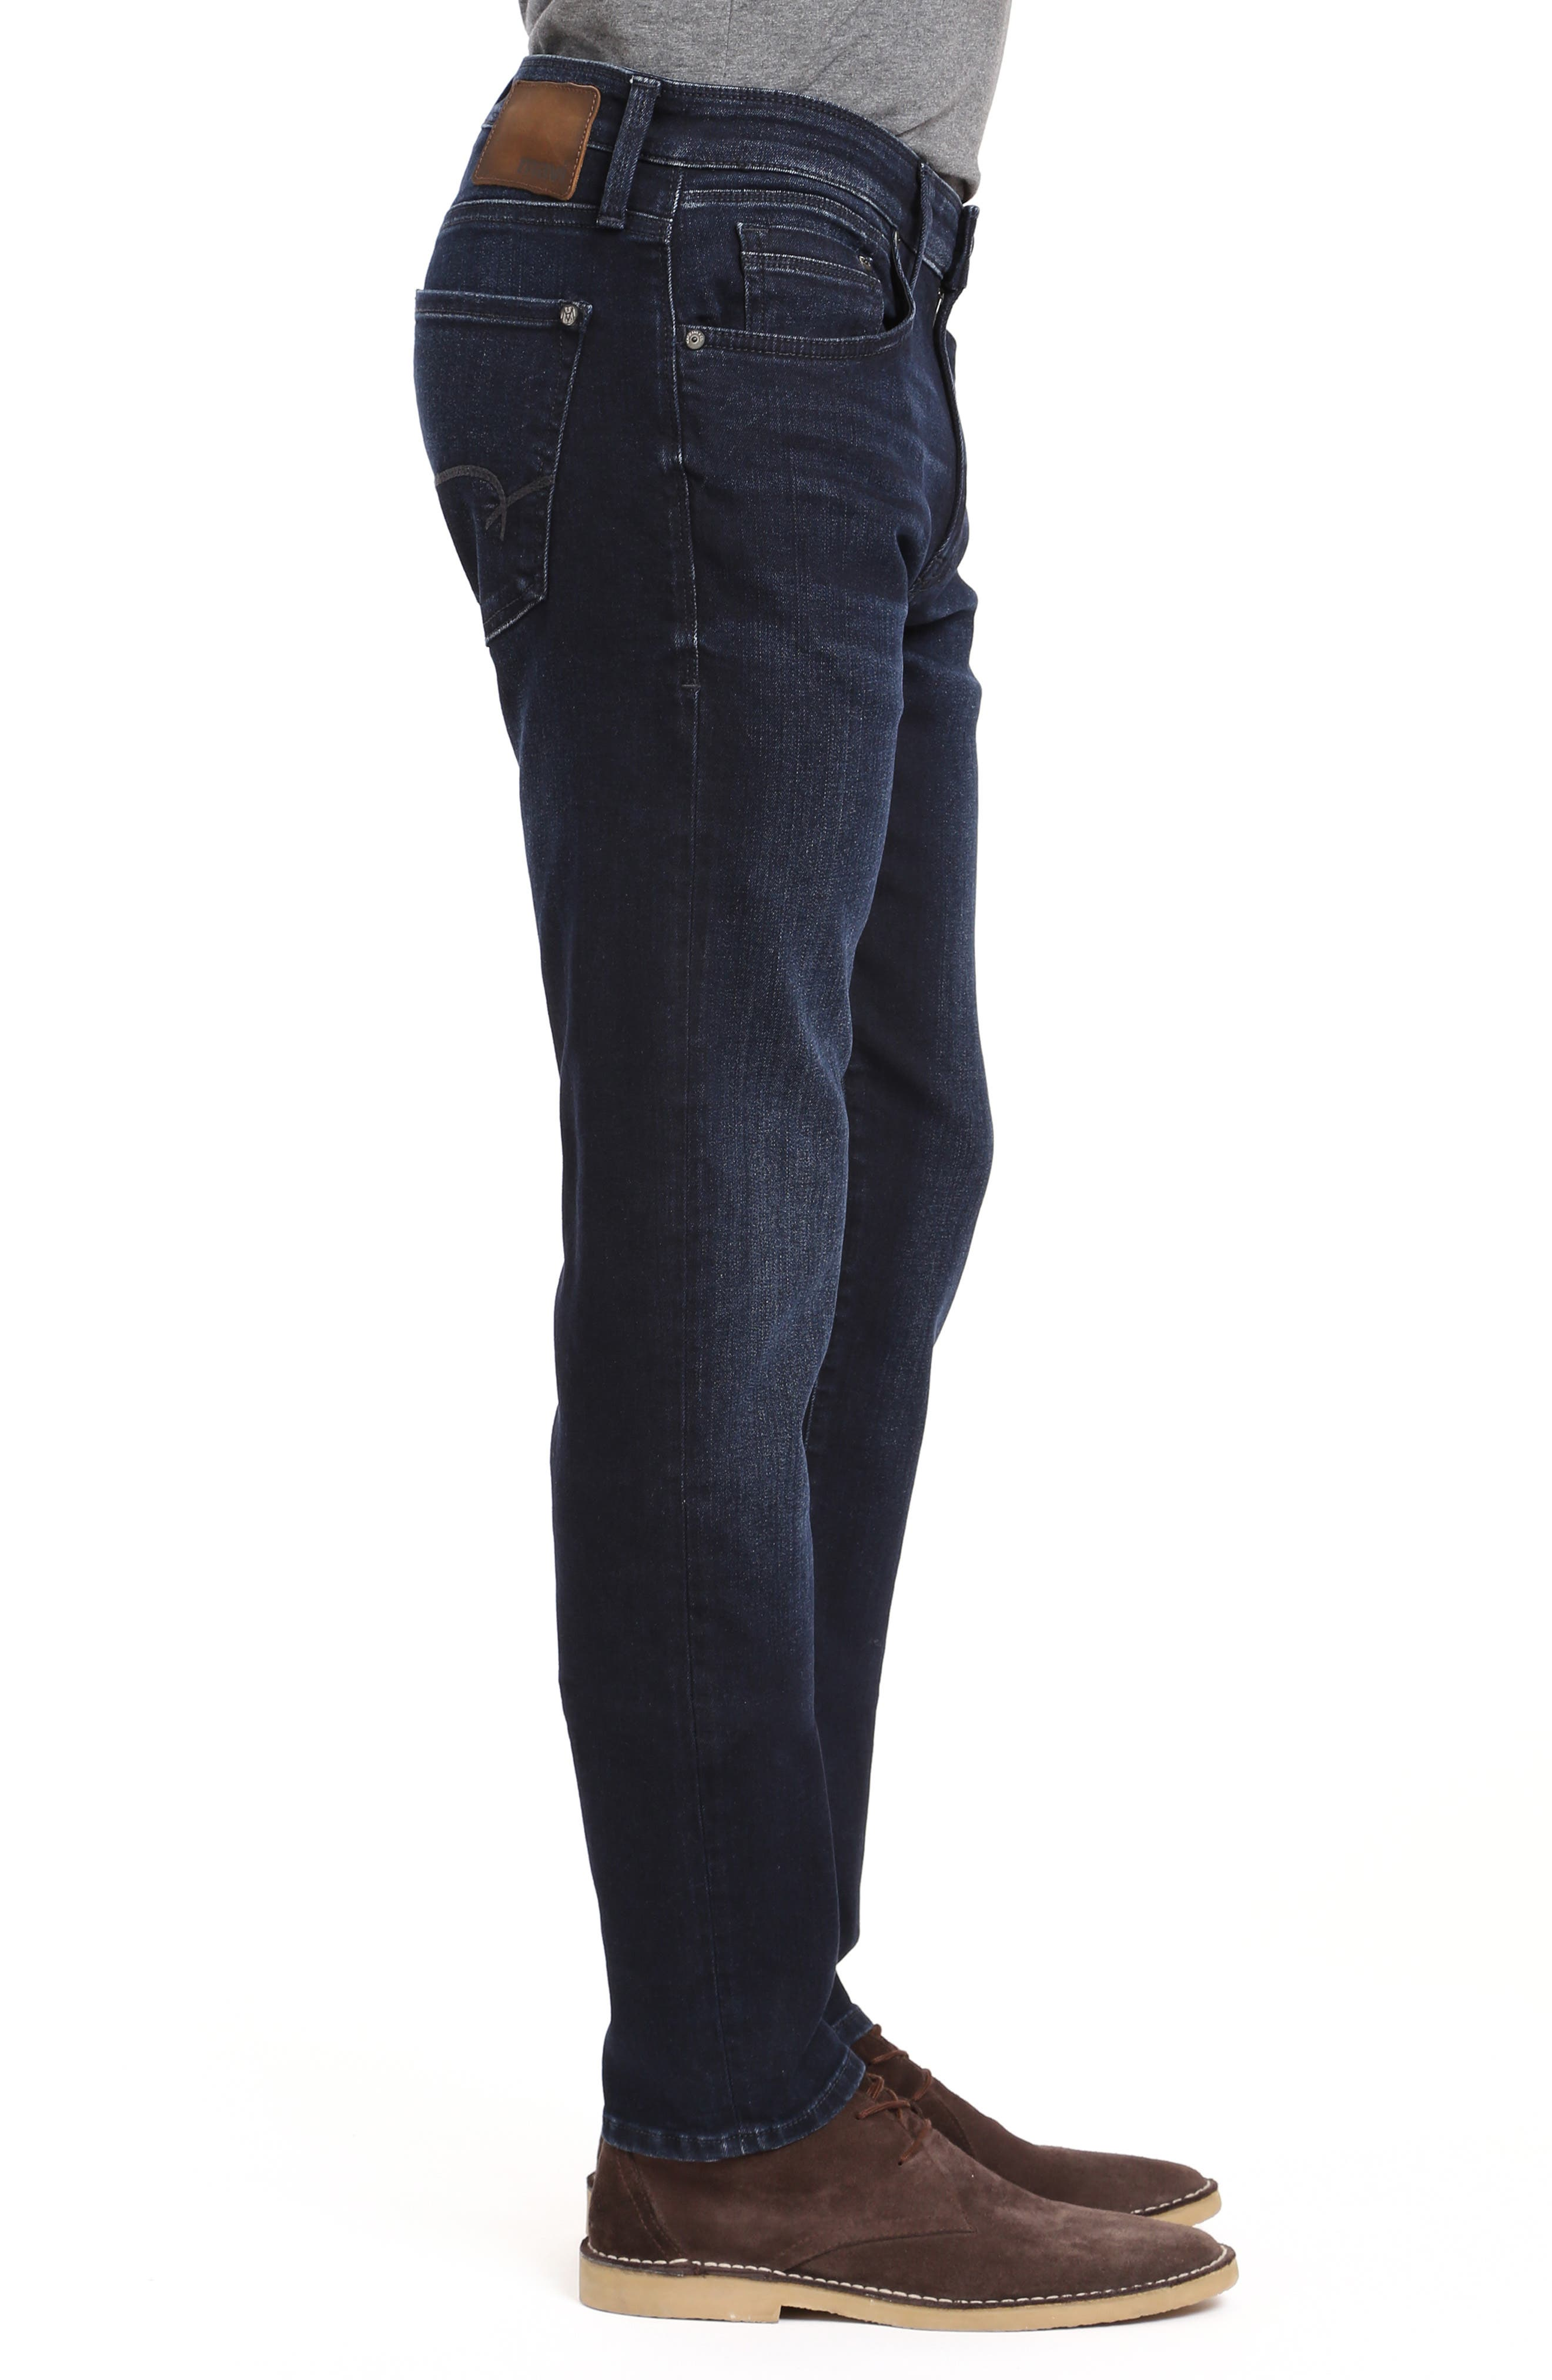 Jake Skinny Fit Jeans,                             Alternate thumbnail 3, color,                             INK FOGGY WILLIAMSBURG